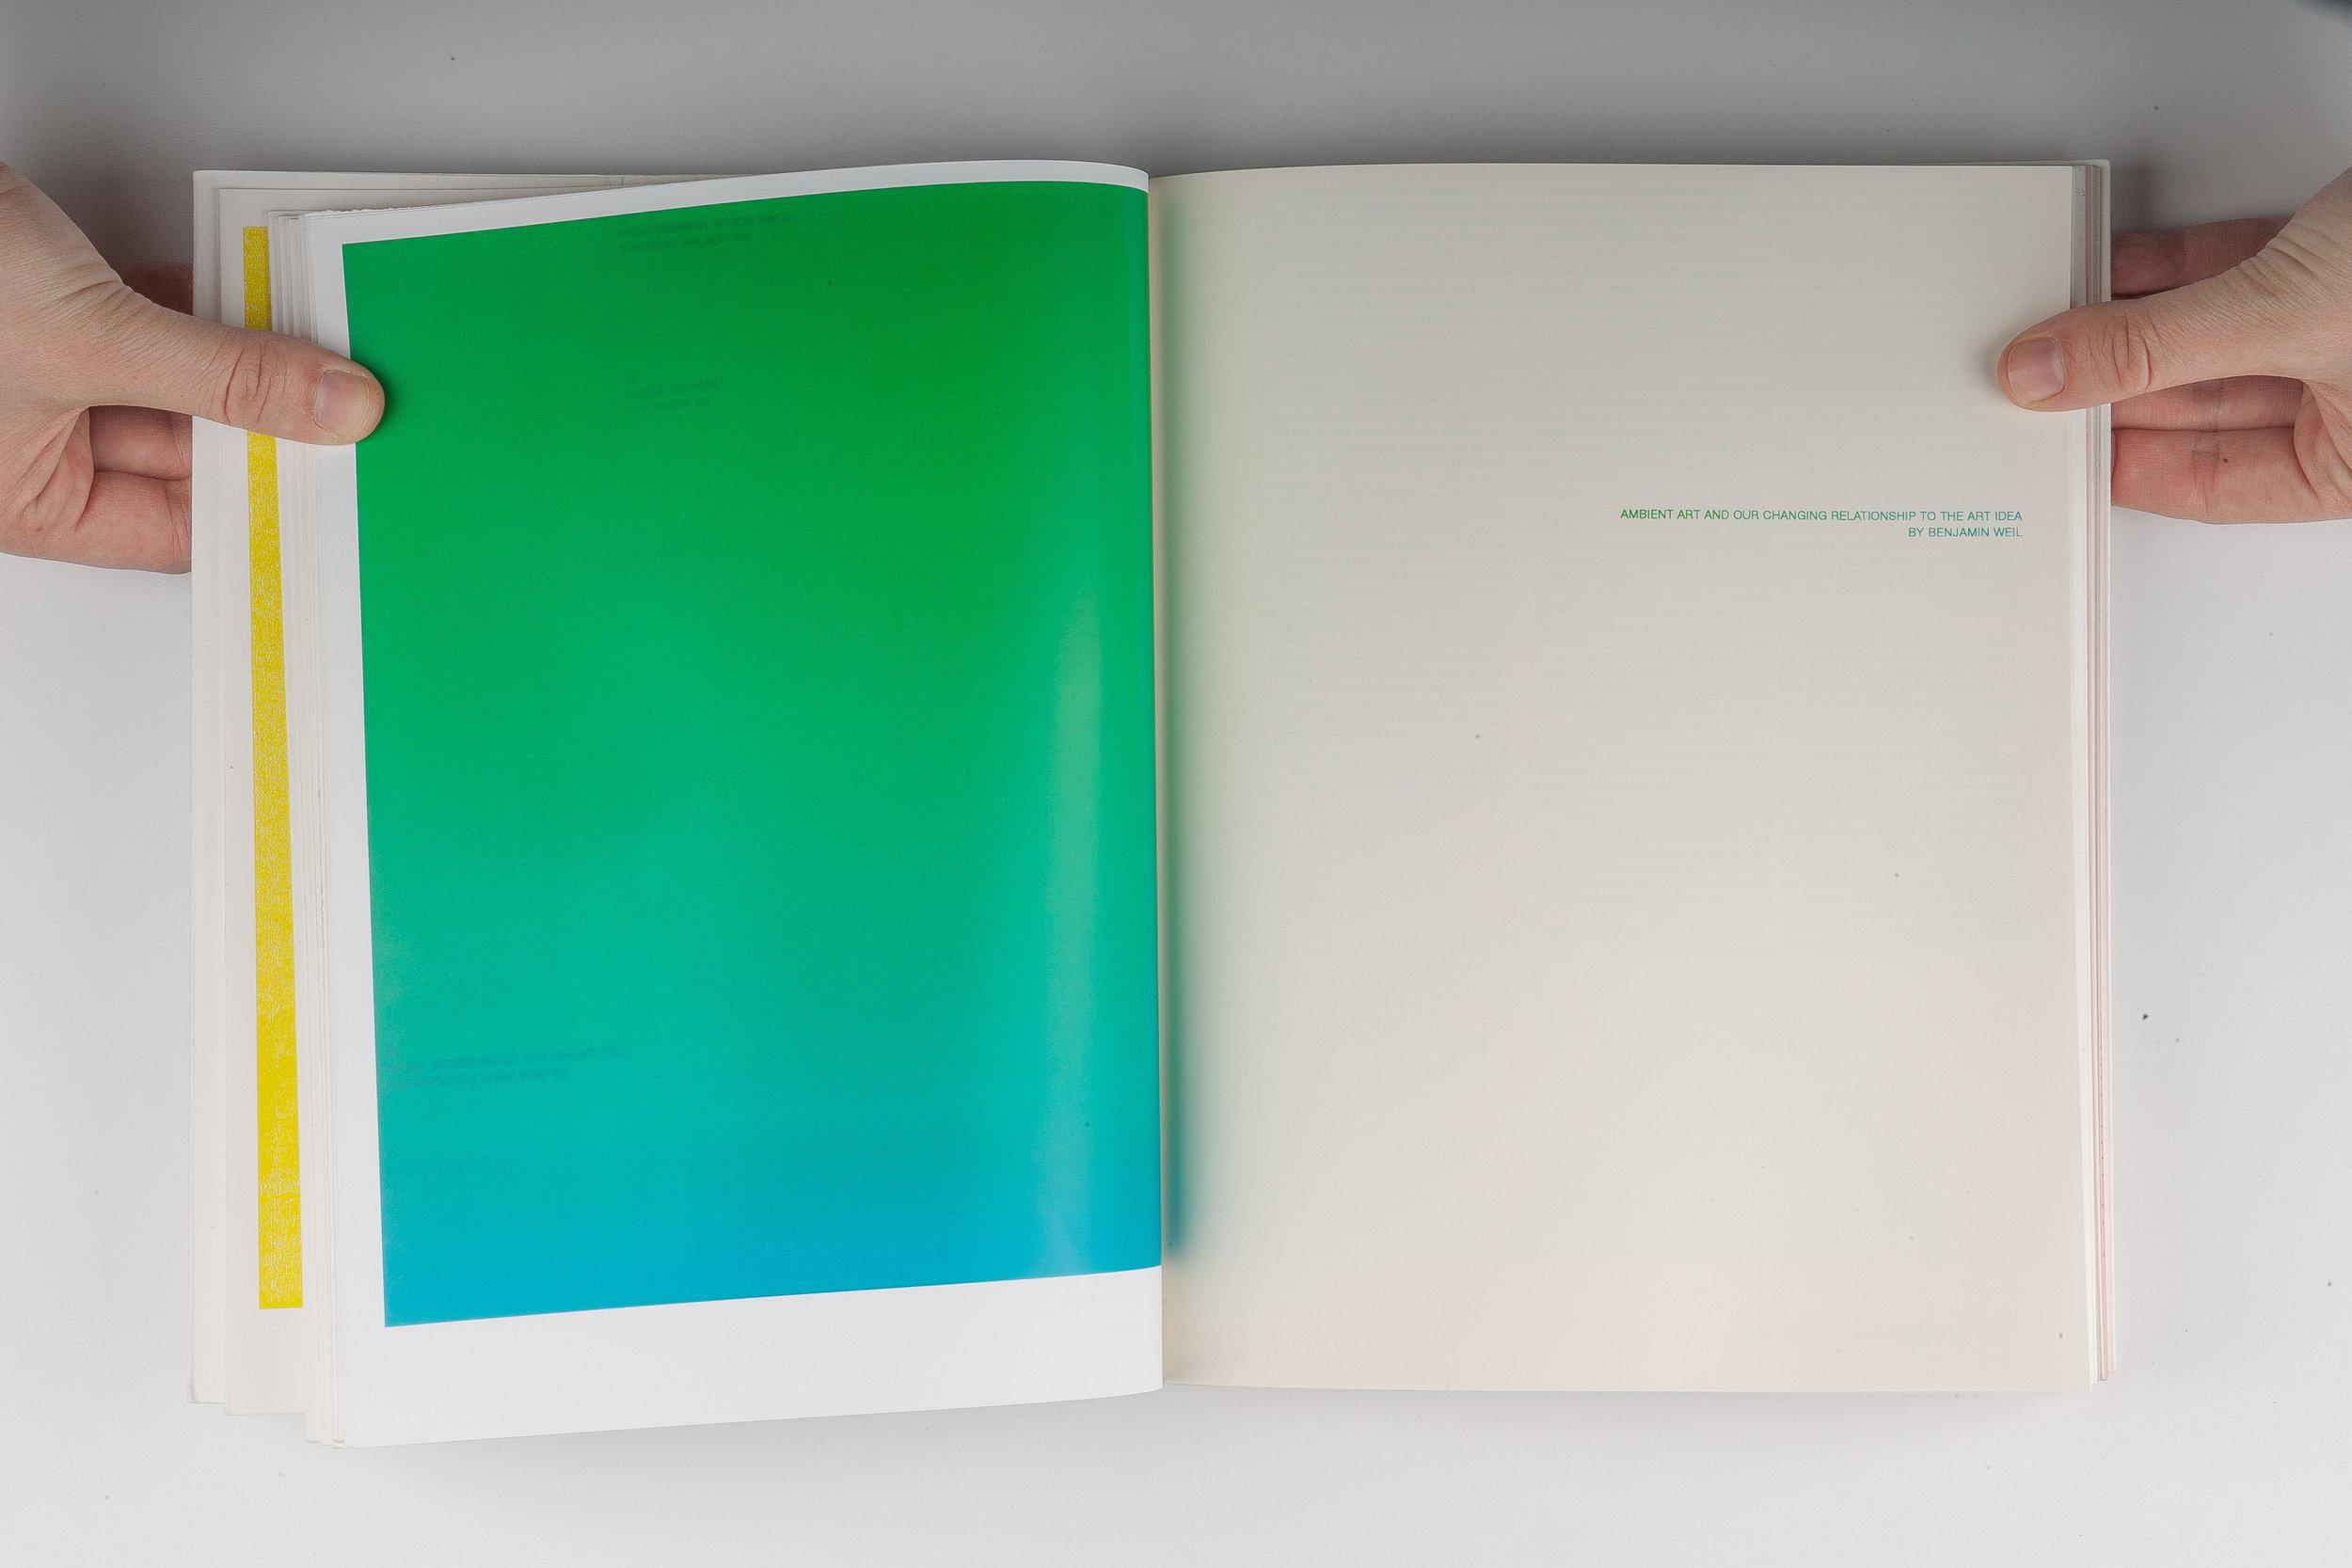 Sound Field, Elizabeth Azen, artist book, book design, graphic design, typography, grid, screen printing, small press, ambient music, Brian Eno, Jean-Michel Jarre